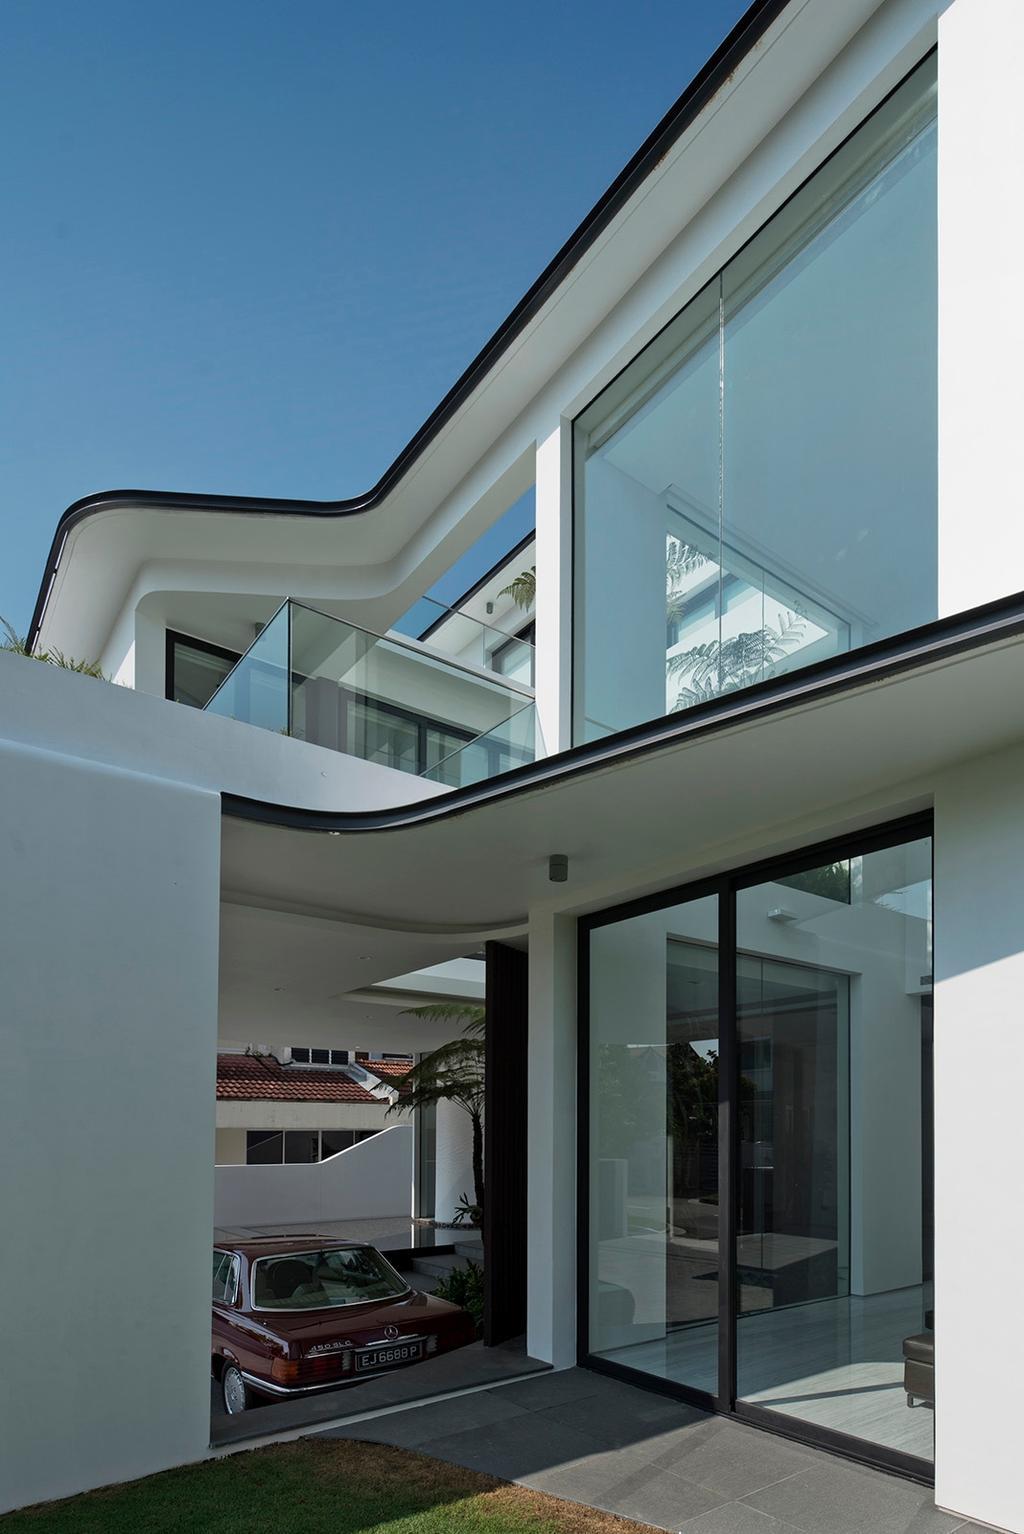 Modern, Landed, Tosca Street, Architect, Kite Studio Architecture, Glass Doors, Sliding Door, Building, Office Building, Architecture, Skylight, Window